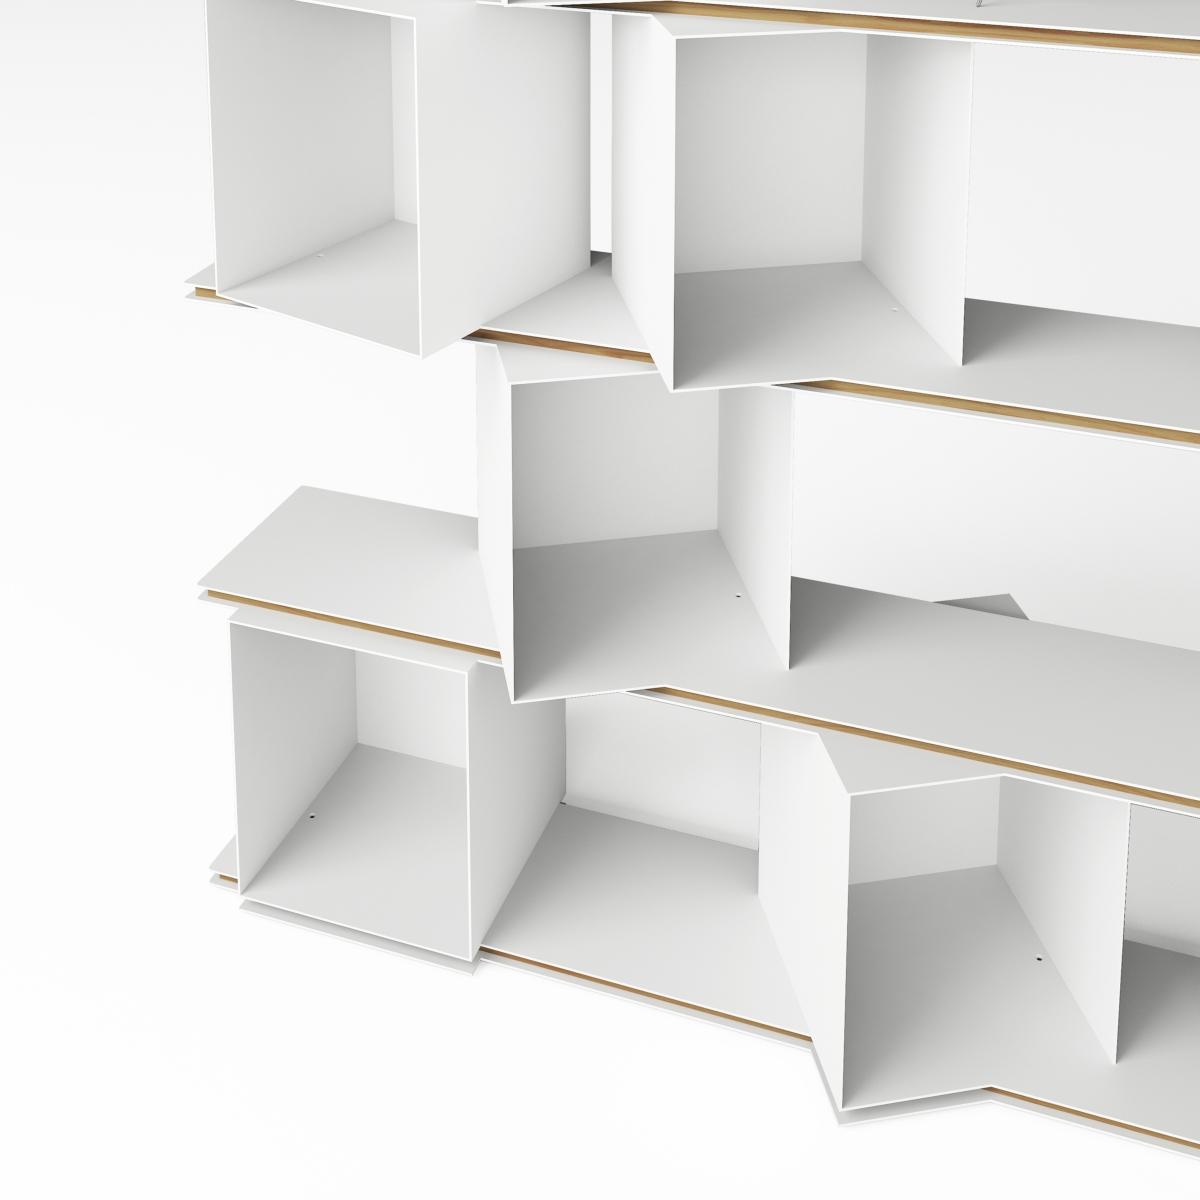 Domitalia Bodega modular biblioteca